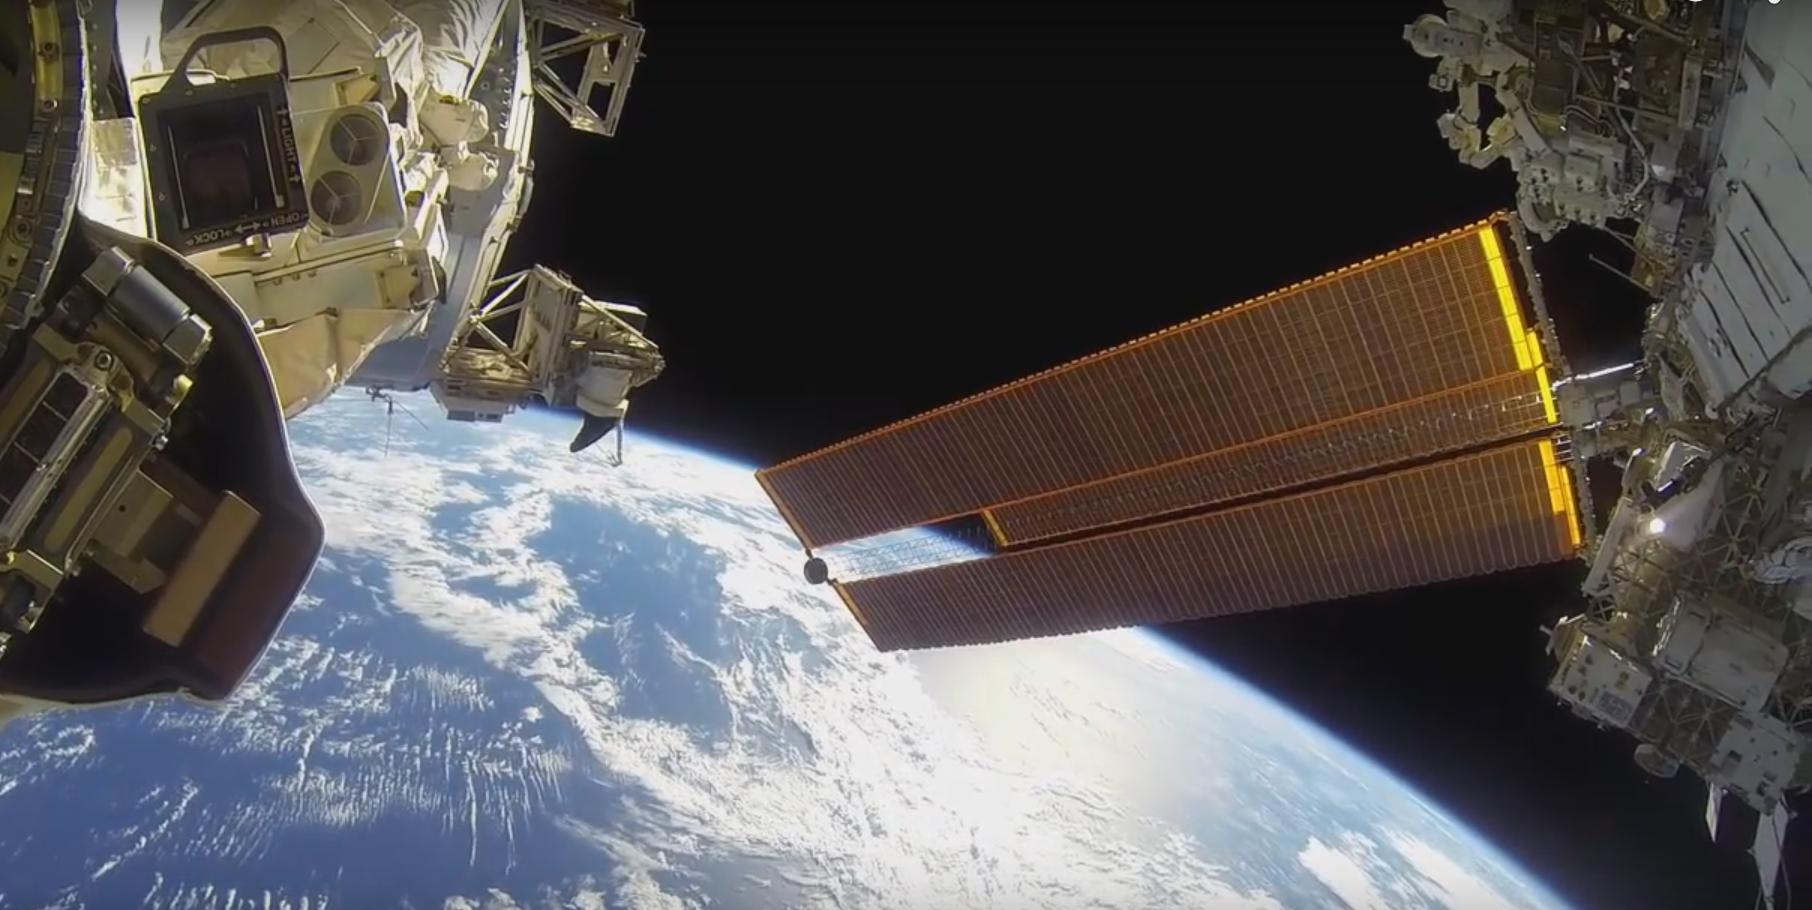 Spacewalk GoPro Footage Is The Best GoPro Footage